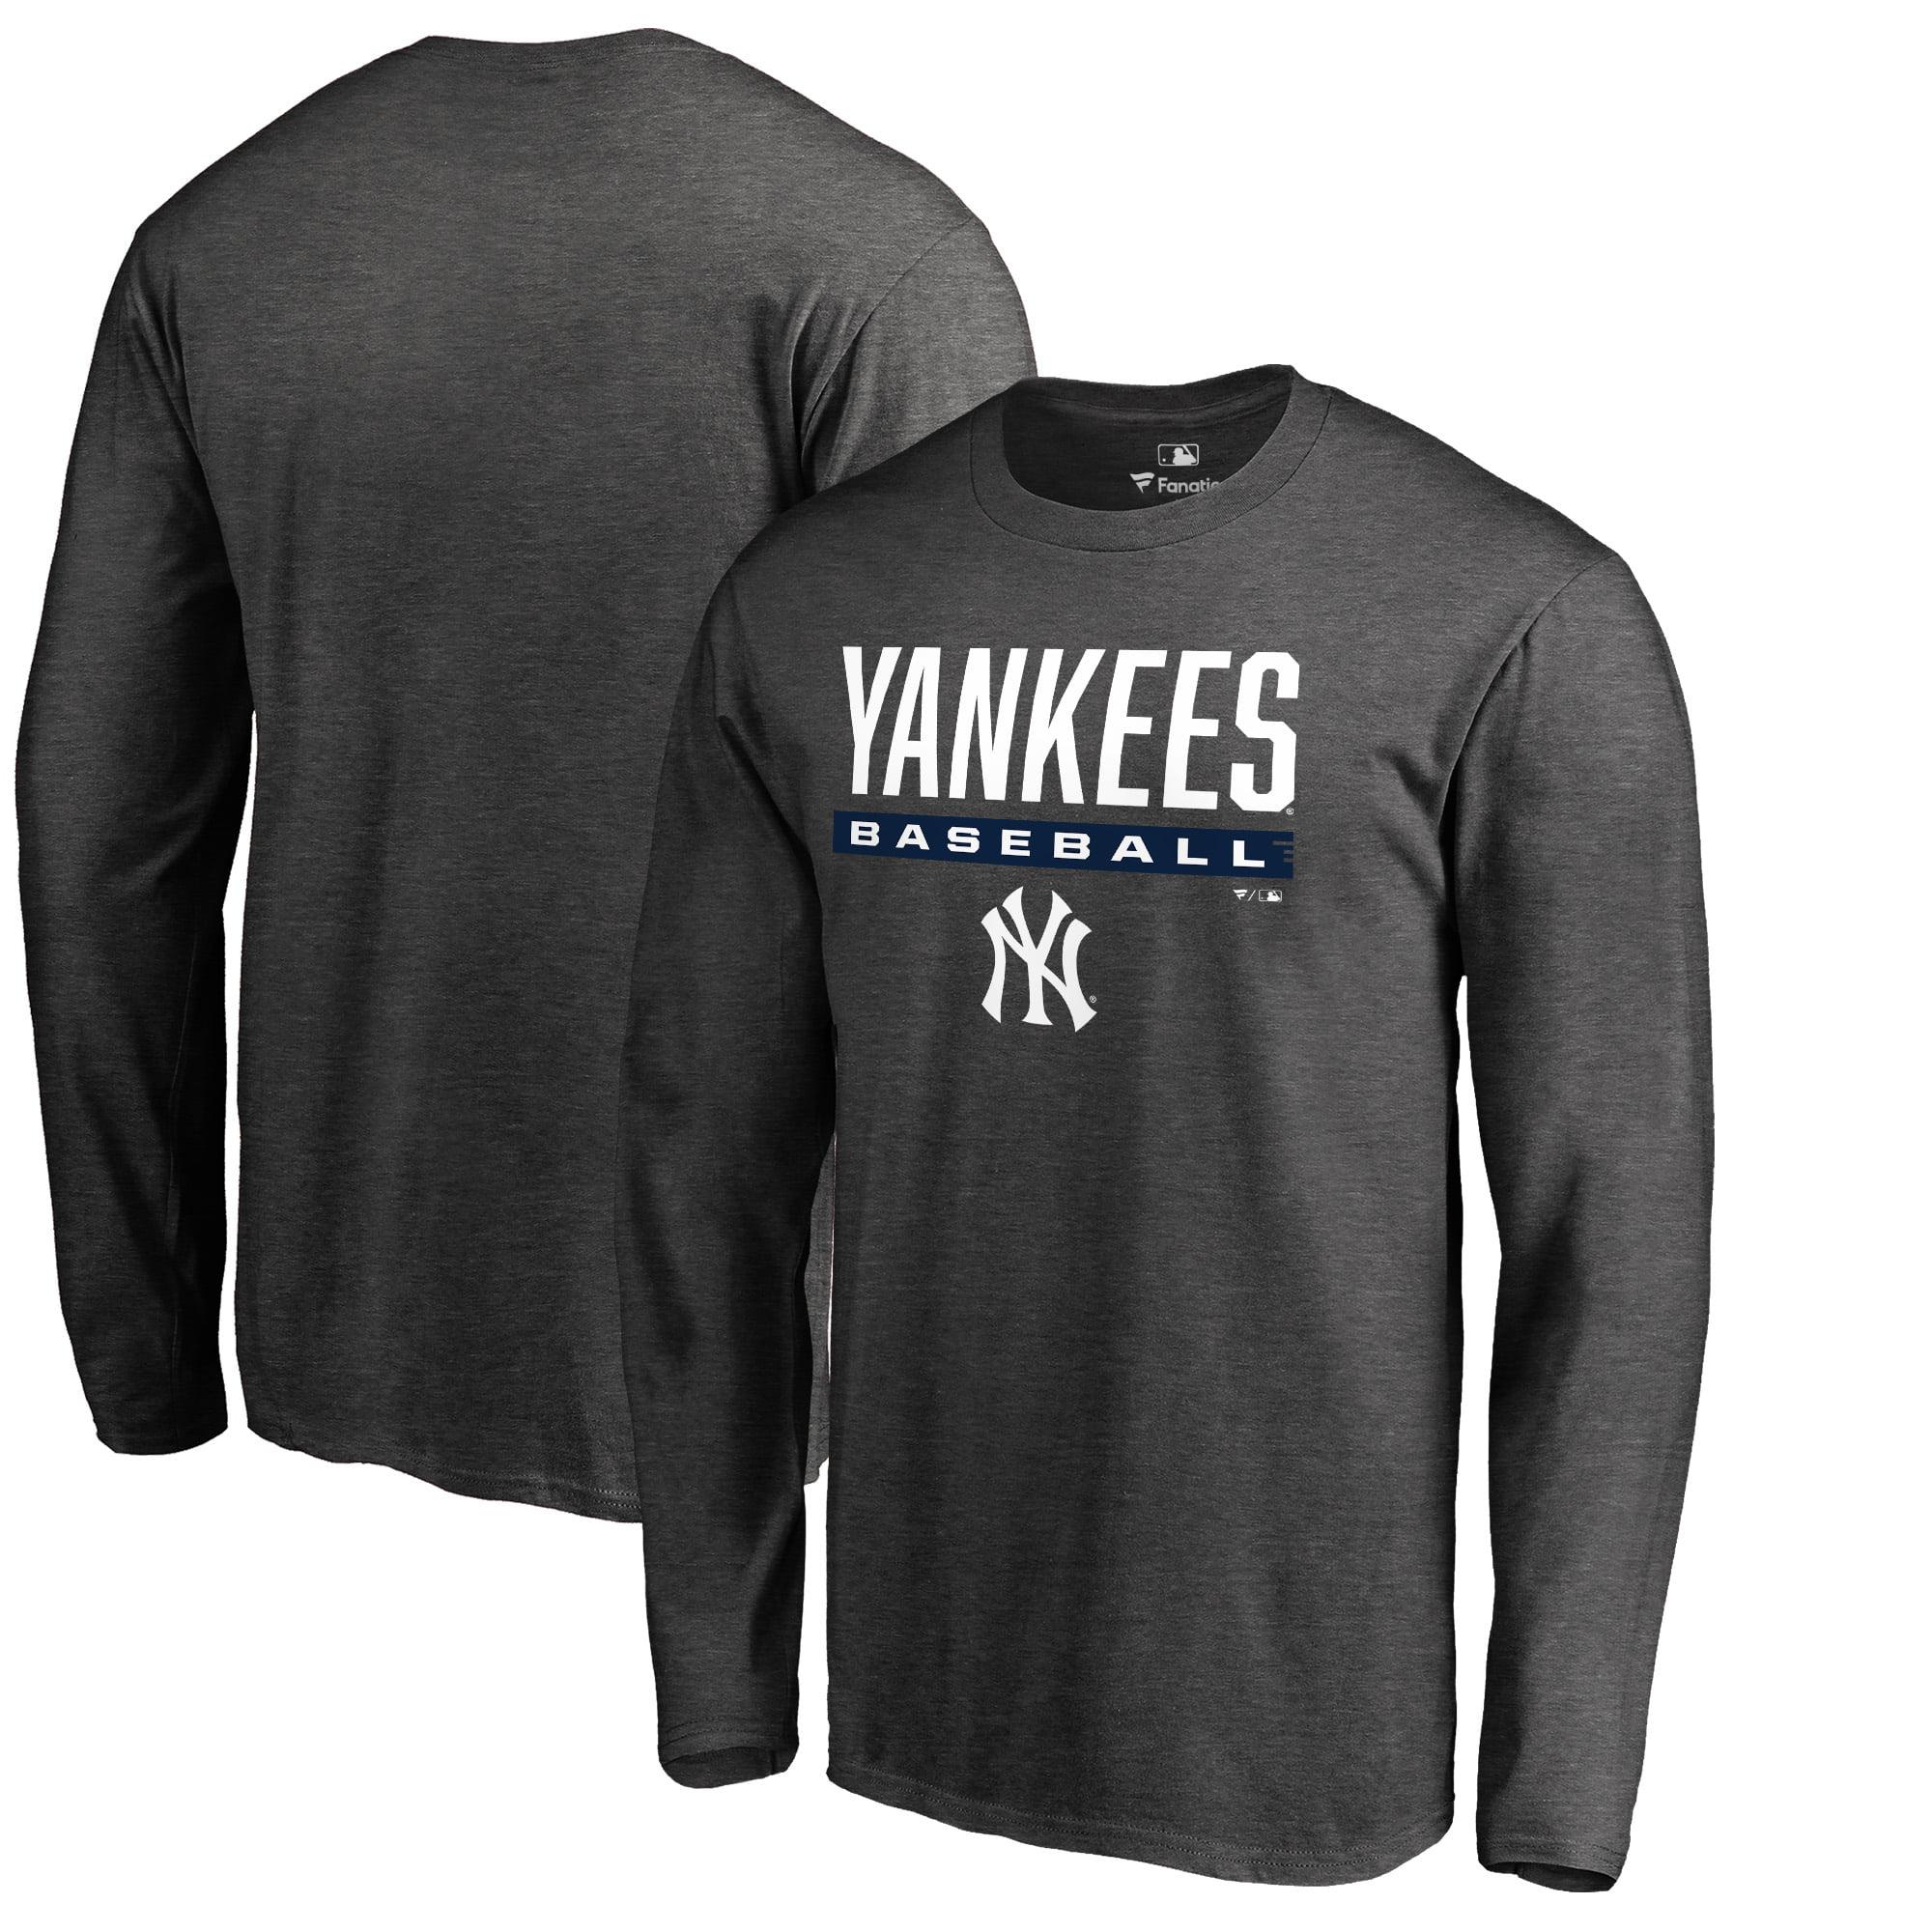 New York Yankees Fanatics Branded Win Stripe Big & Tall Long Sleeve T-Shirt - Heathered Charcoal